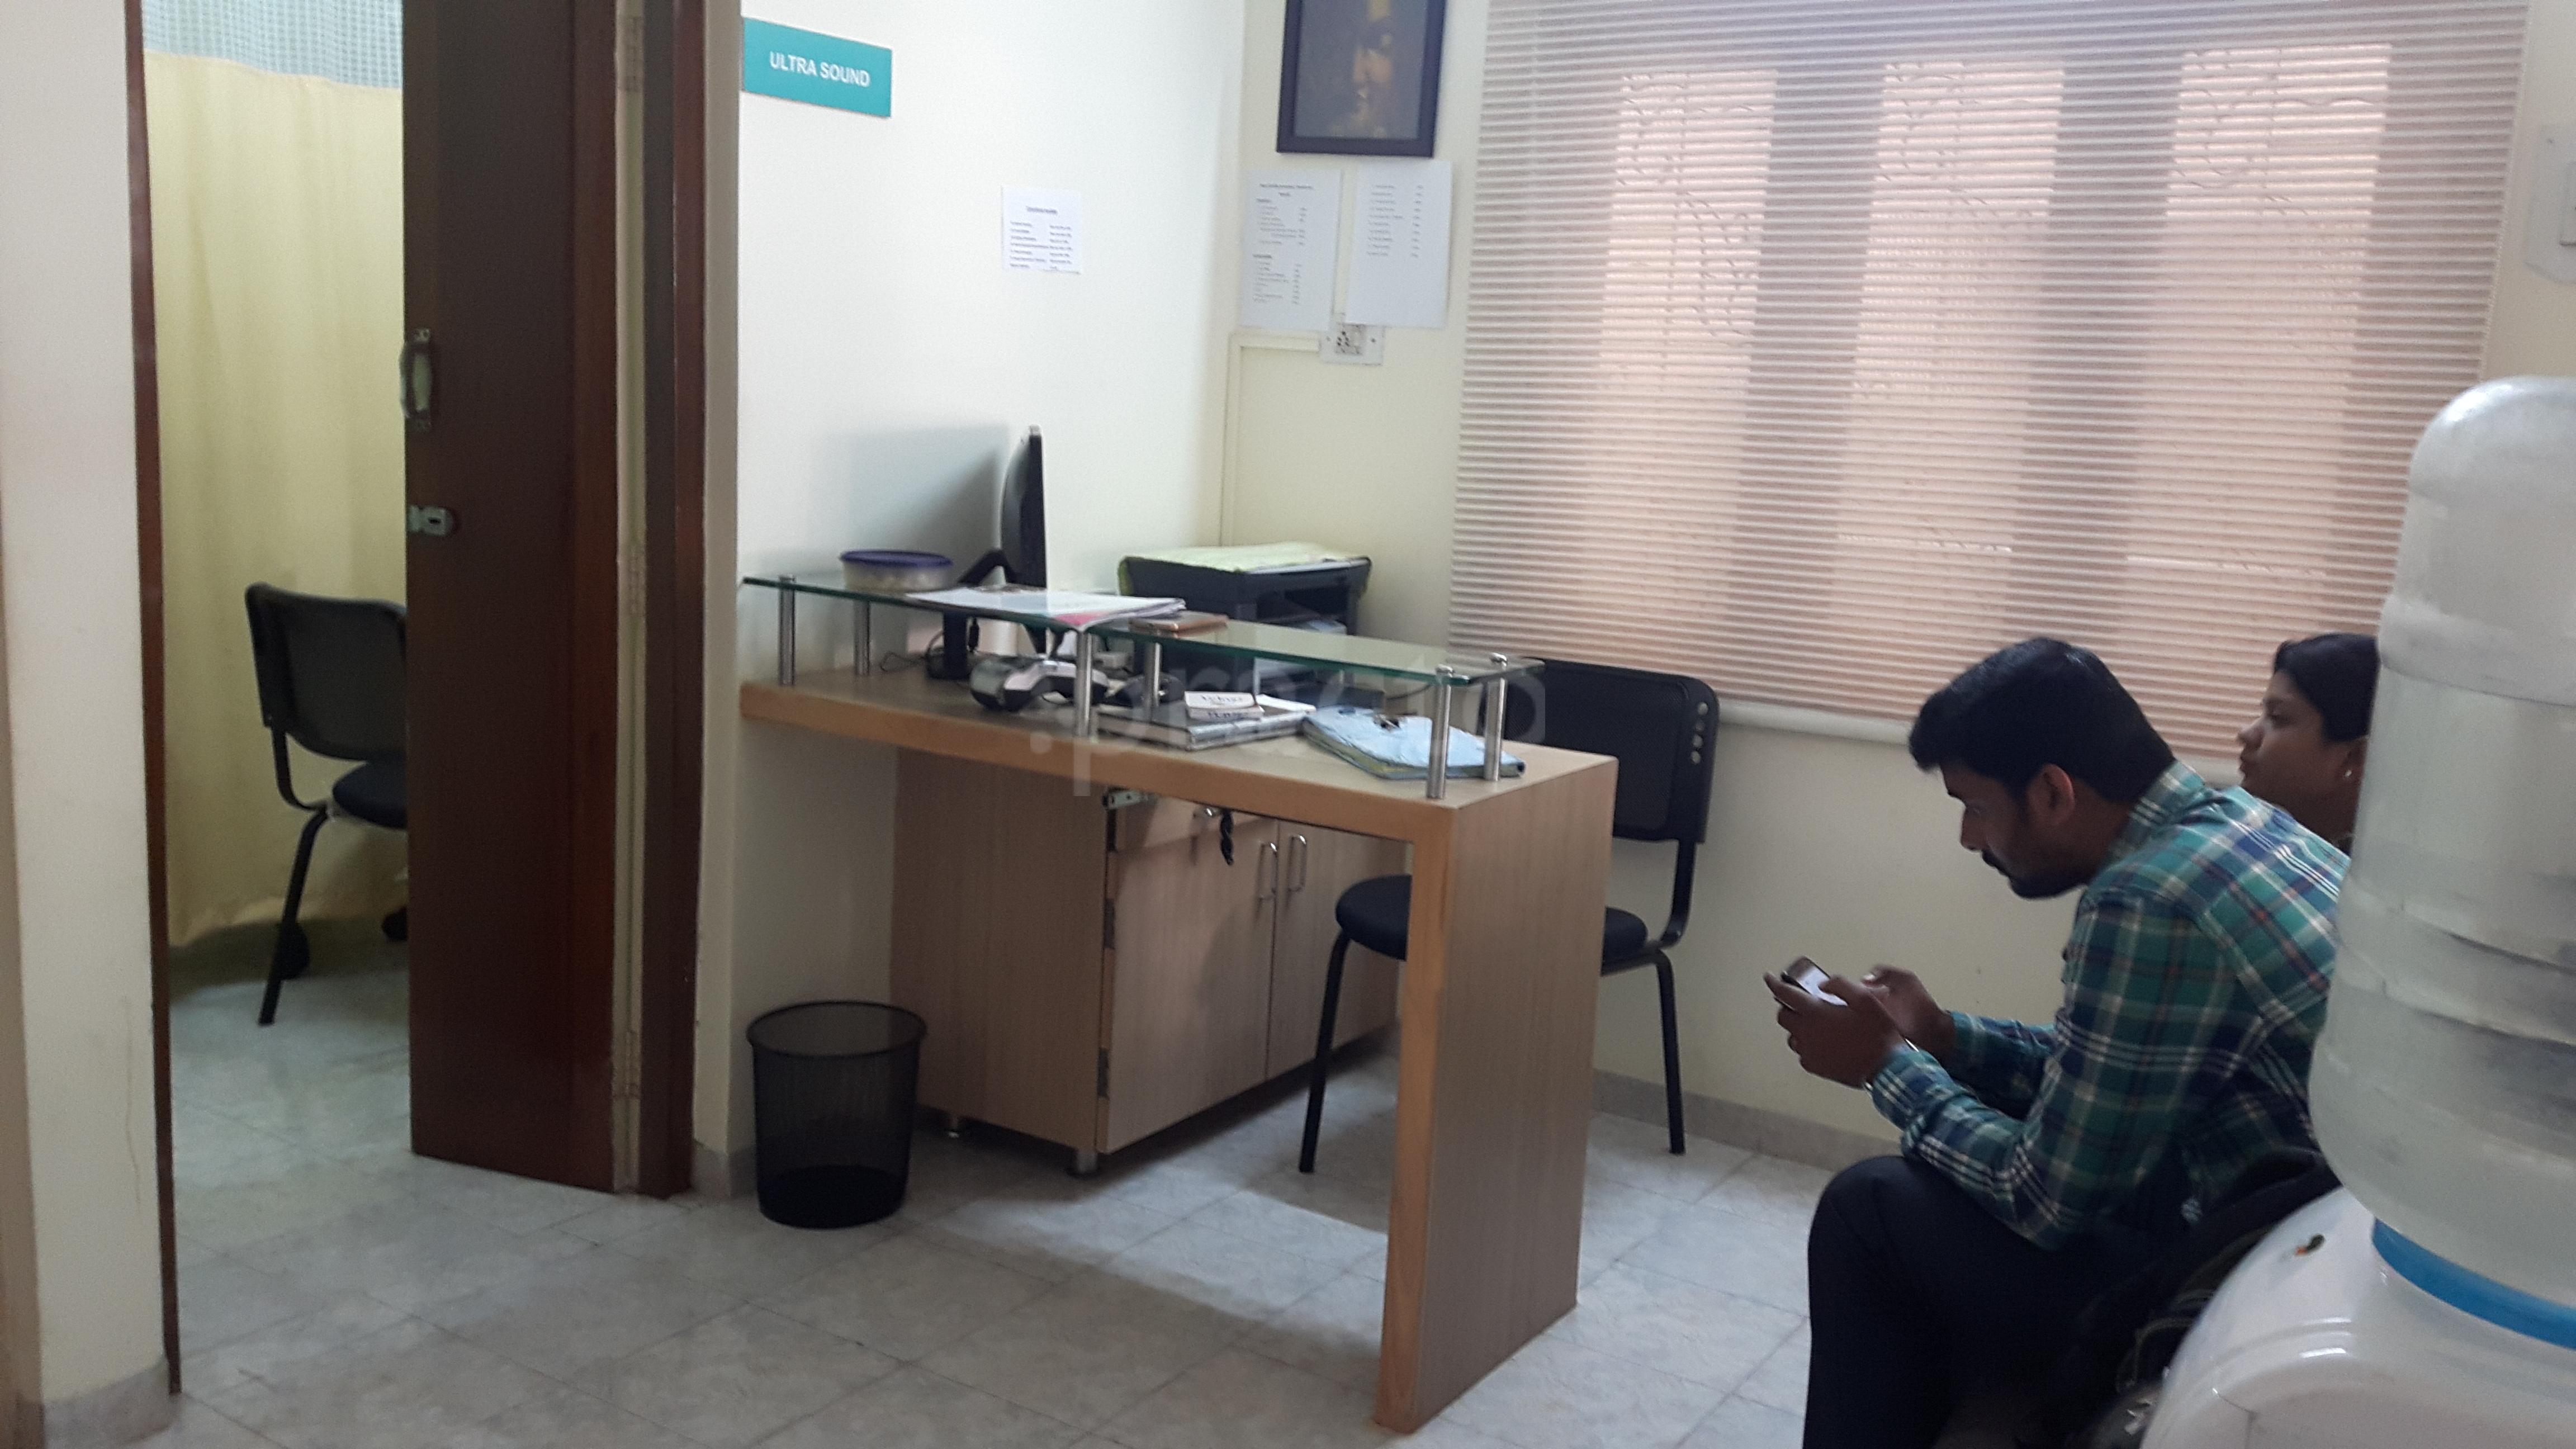 Fish aquarium in jayanagar - Doctors In Jayanagar 7 Block Bangalore Book Appointment Online View Fees Recommendations Practo